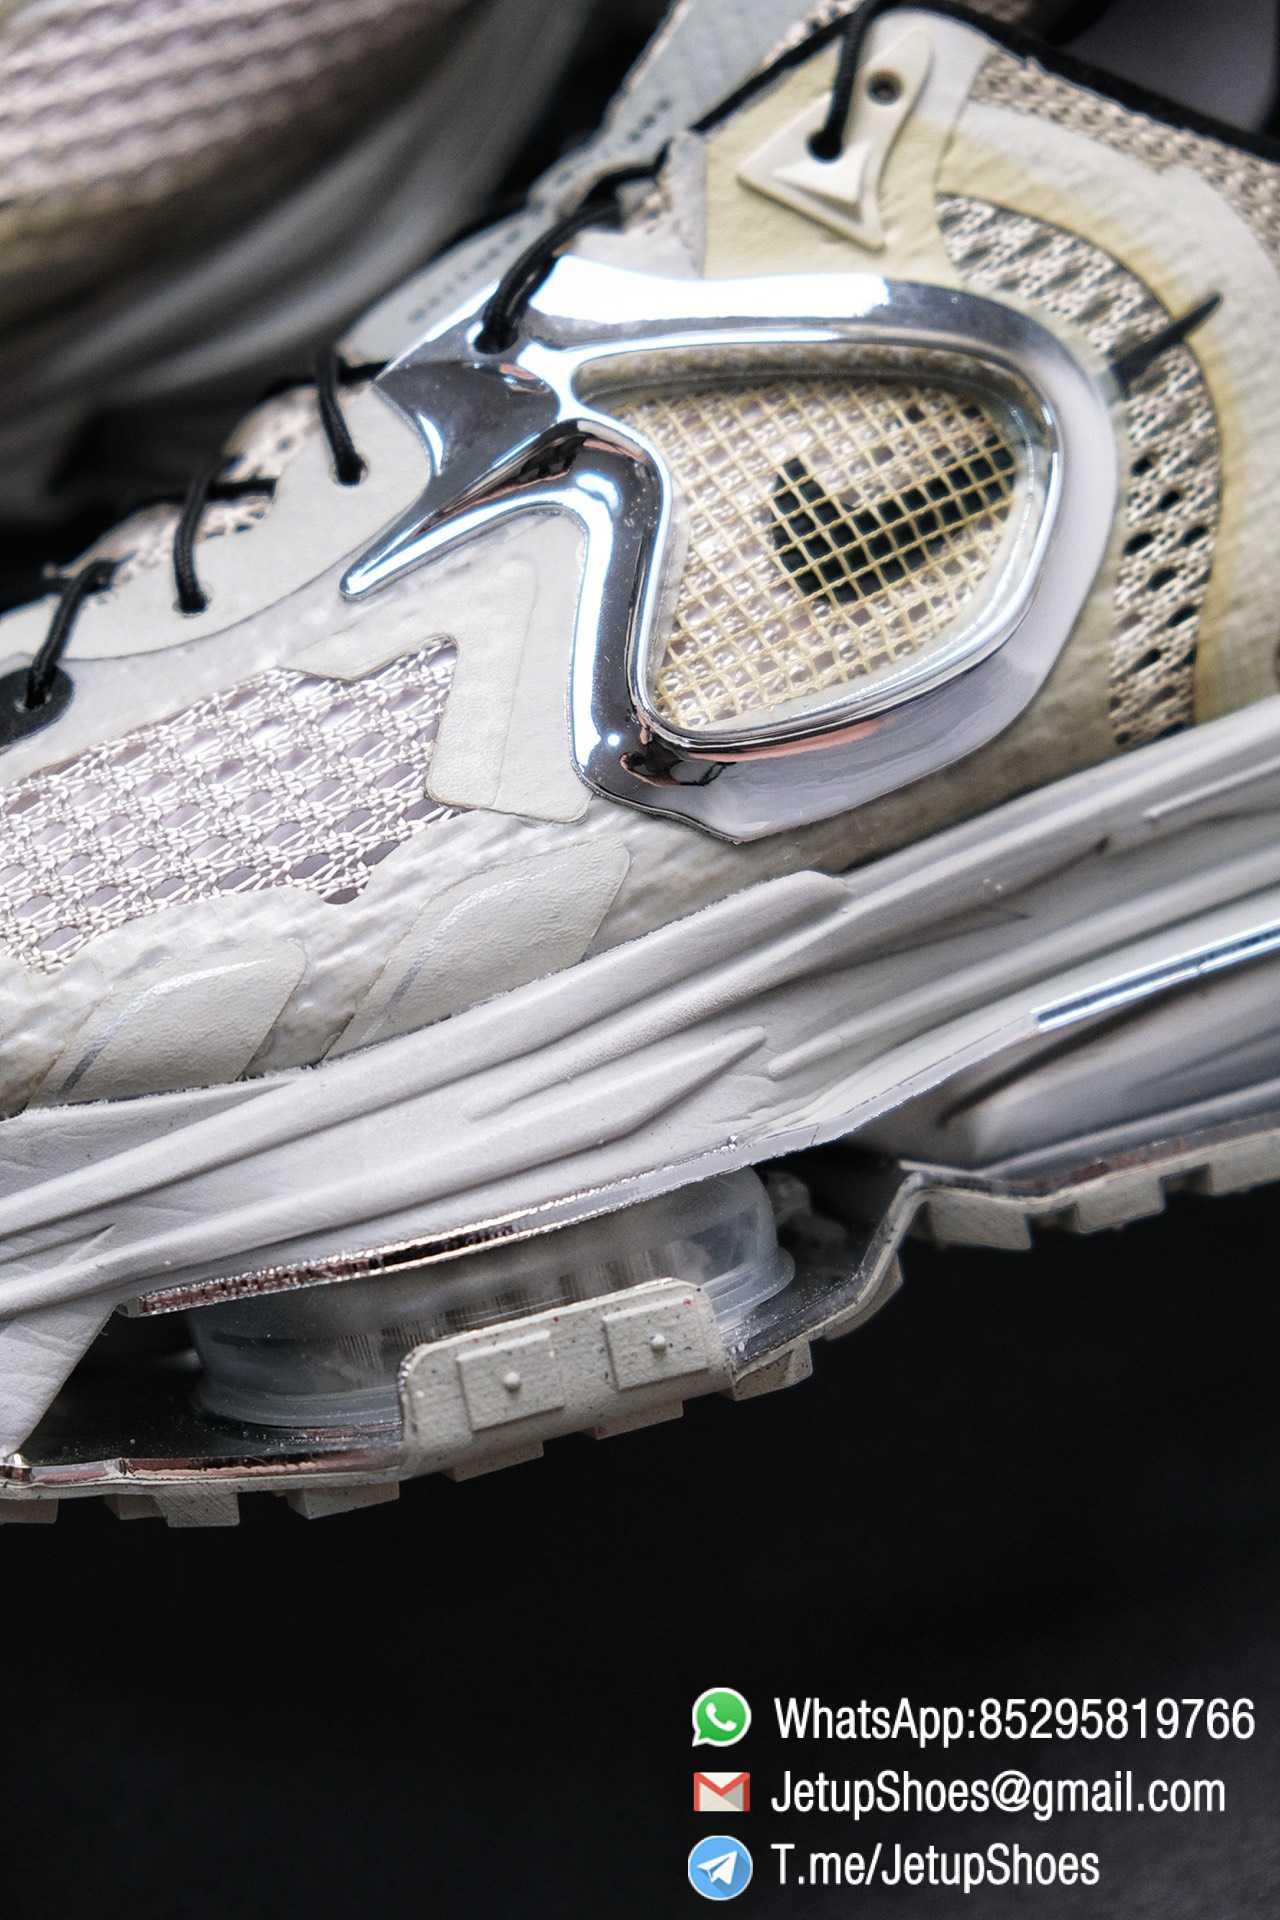 Best Replica Sneakers Matthew M Williams x Nike Zoom 004 Stone CU0676 200 Top Sneakers 06